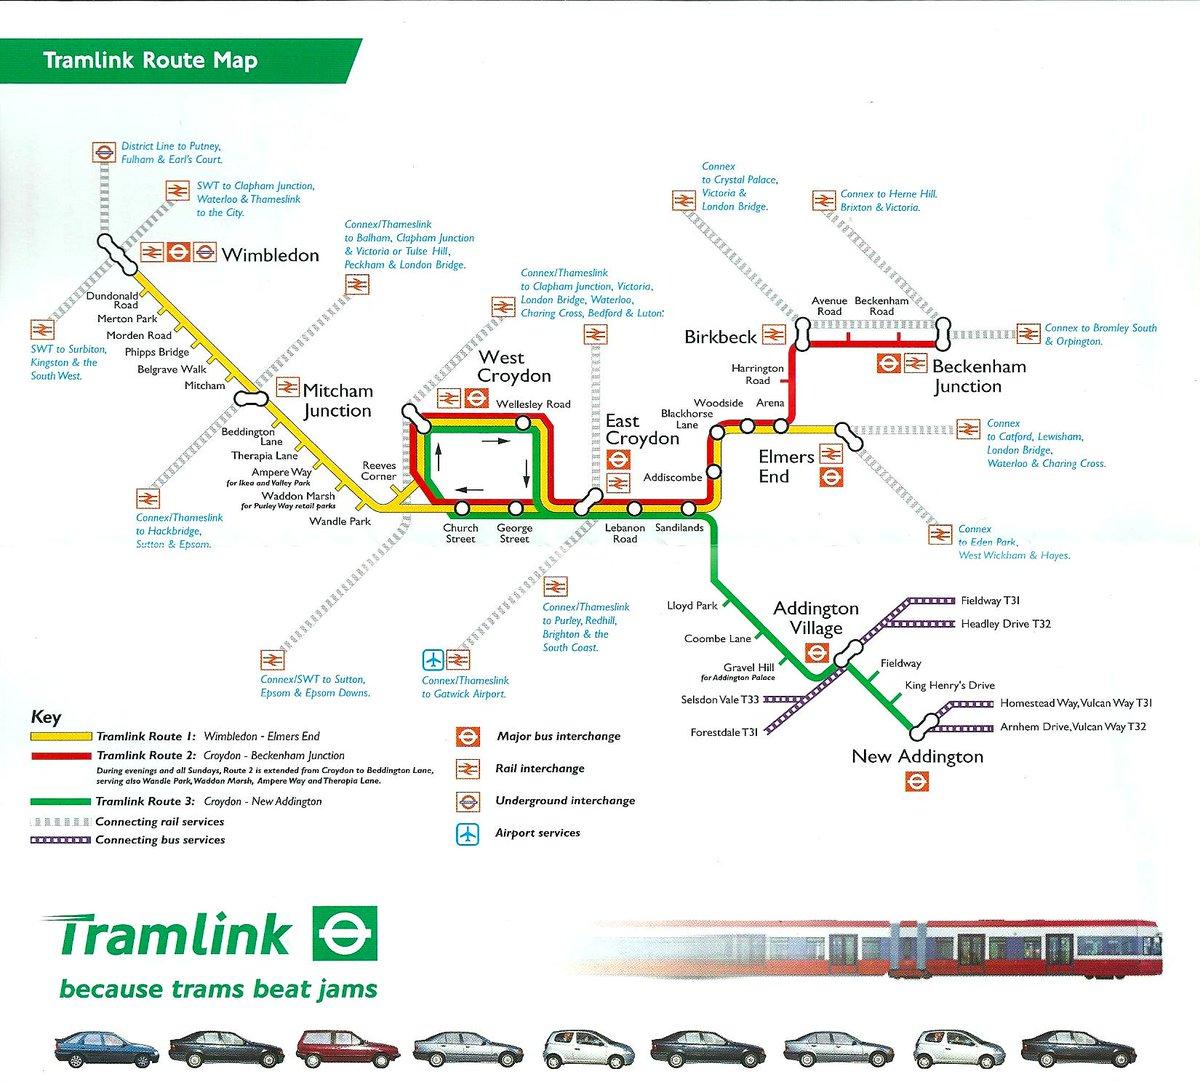 CCZs4TmWEAEhu0N - Croydon Tramlink 20th Anniversary